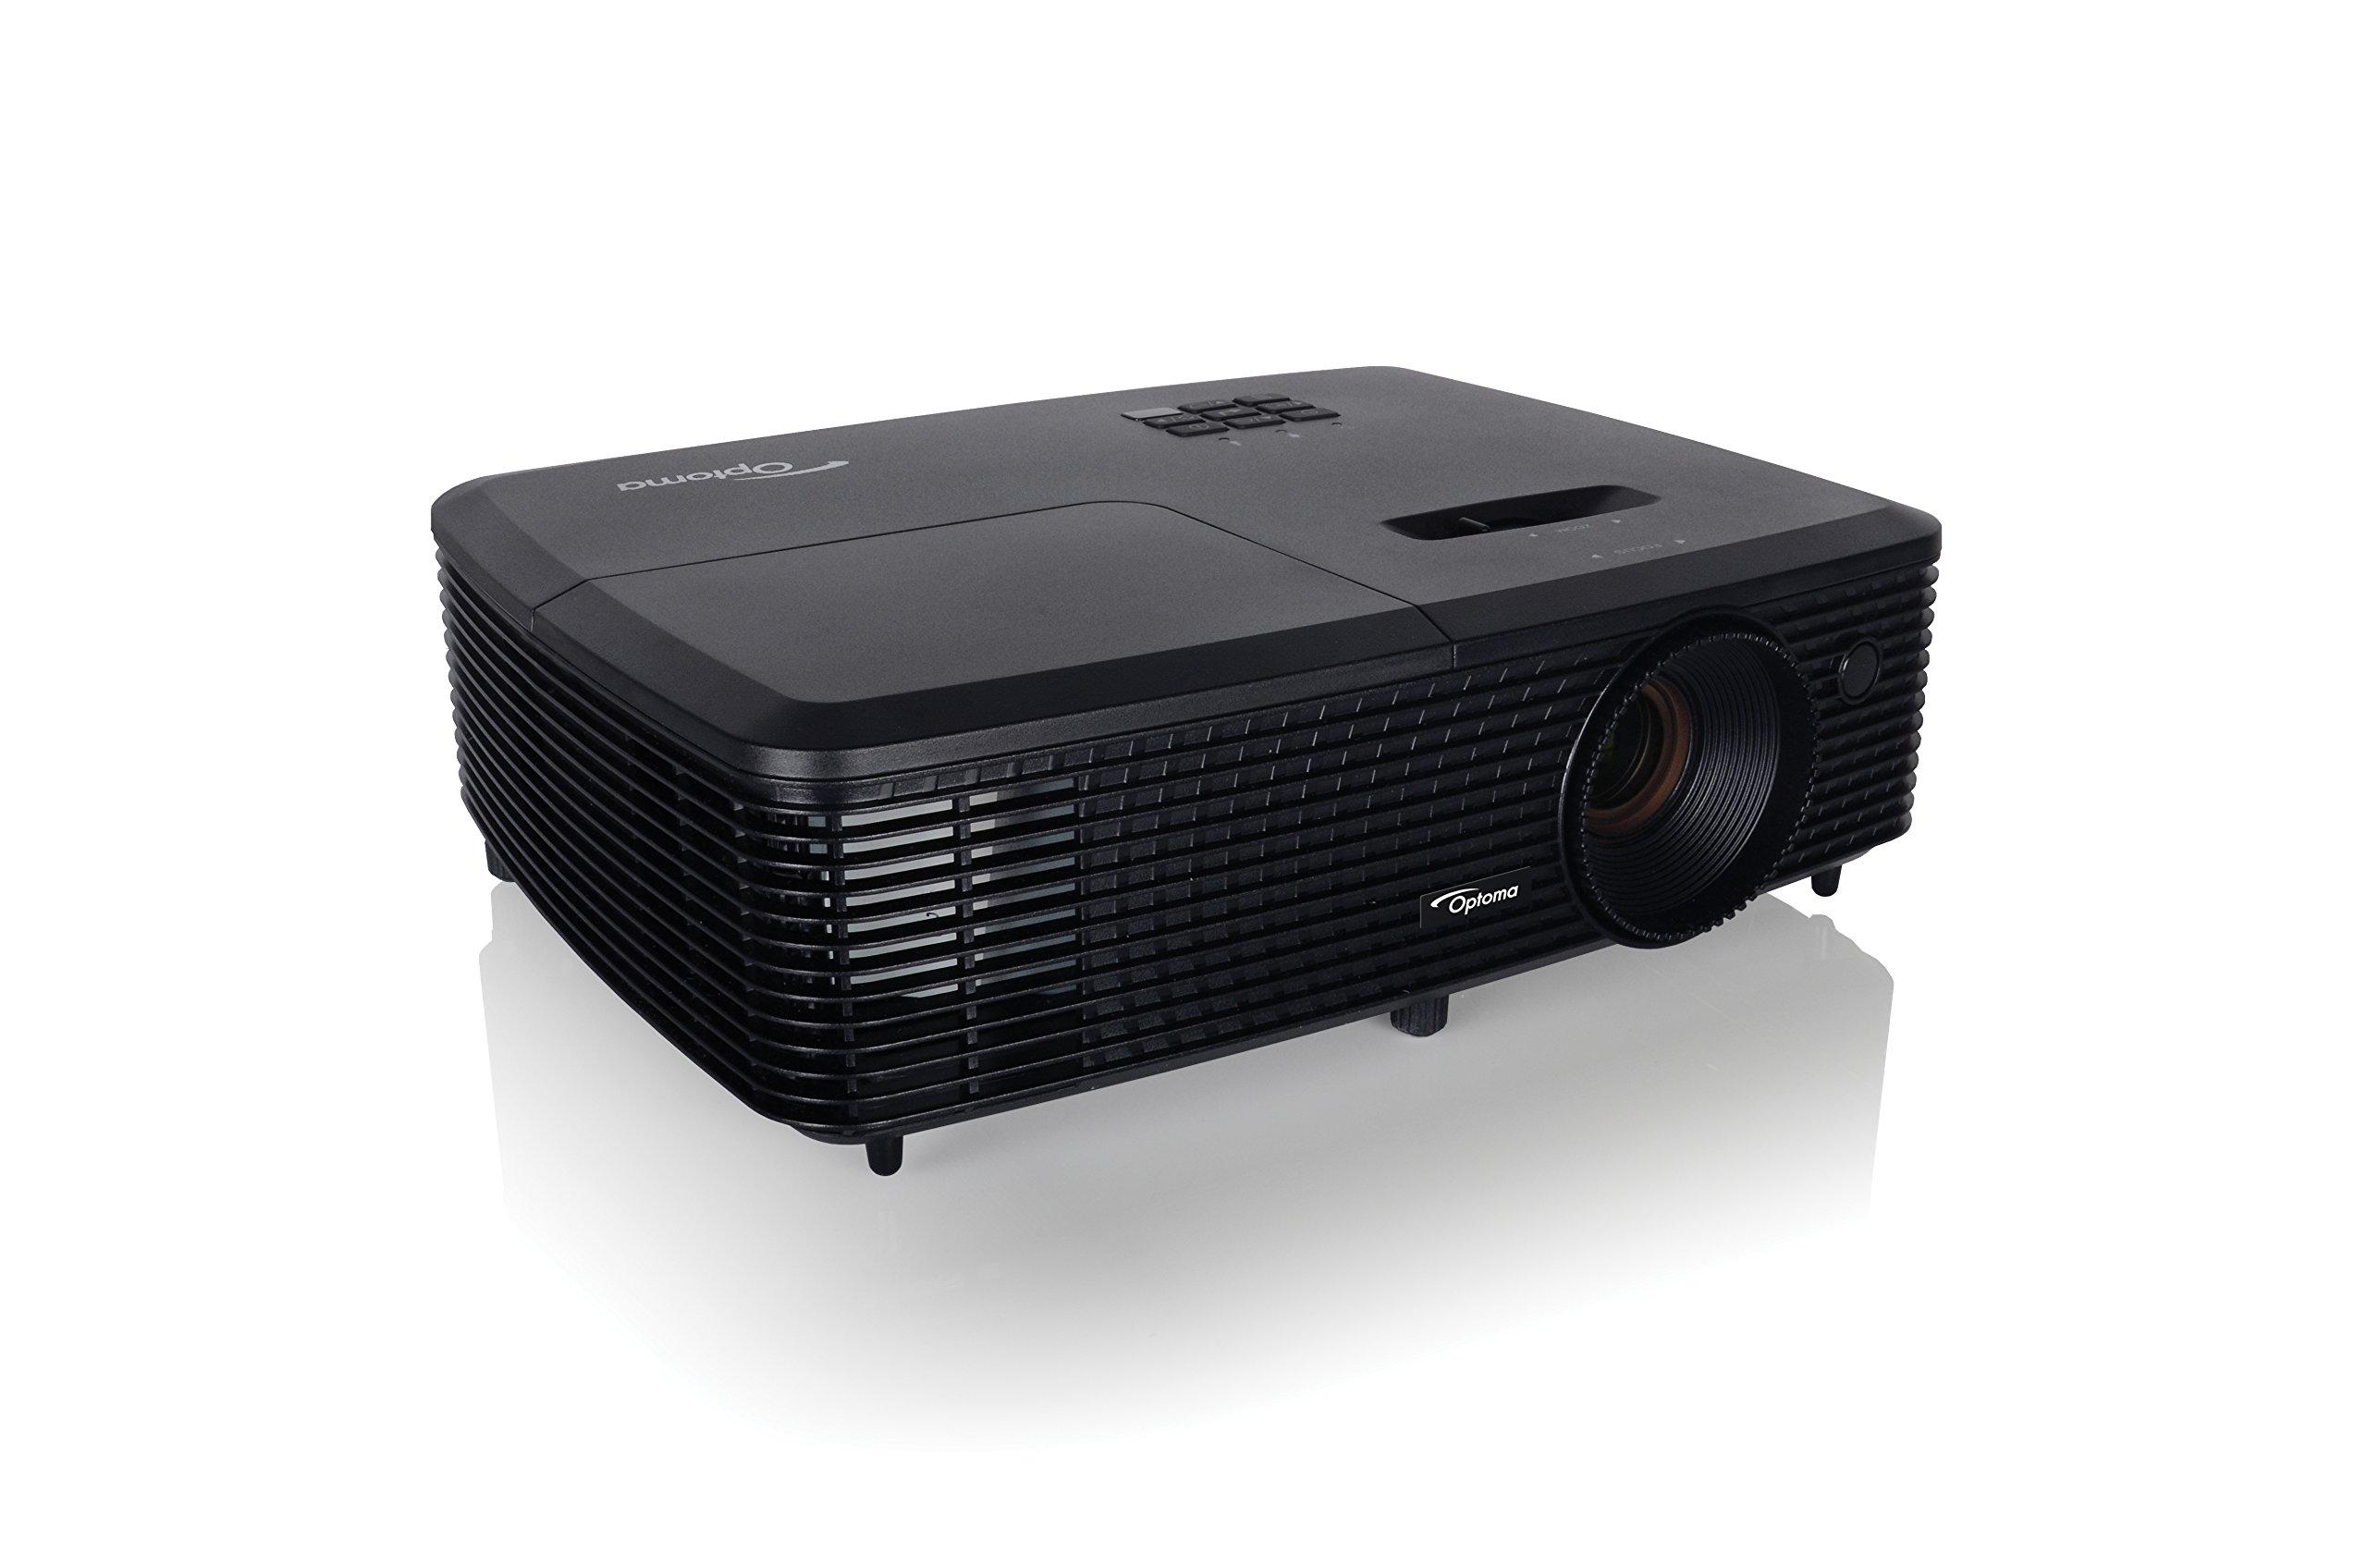 71SRBUz6yYL - Optoma DS348 SVGA DLP HDMI 3000 Lumens Full 3D Projector - Black